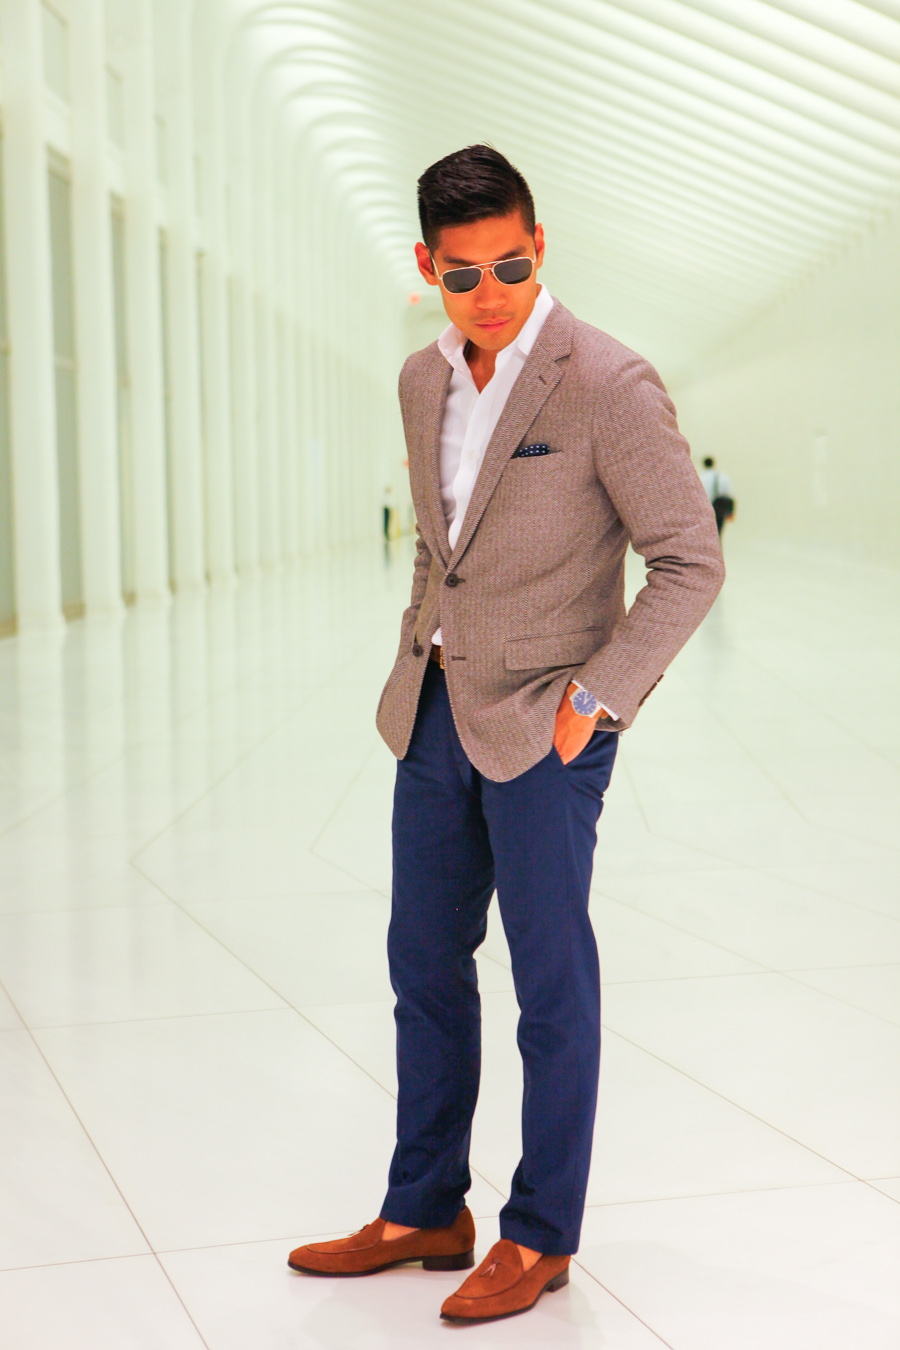 Levitate Style, Menswear, Bonobo, Italian Knit Blazer, One World Trade Center, Leo Chan